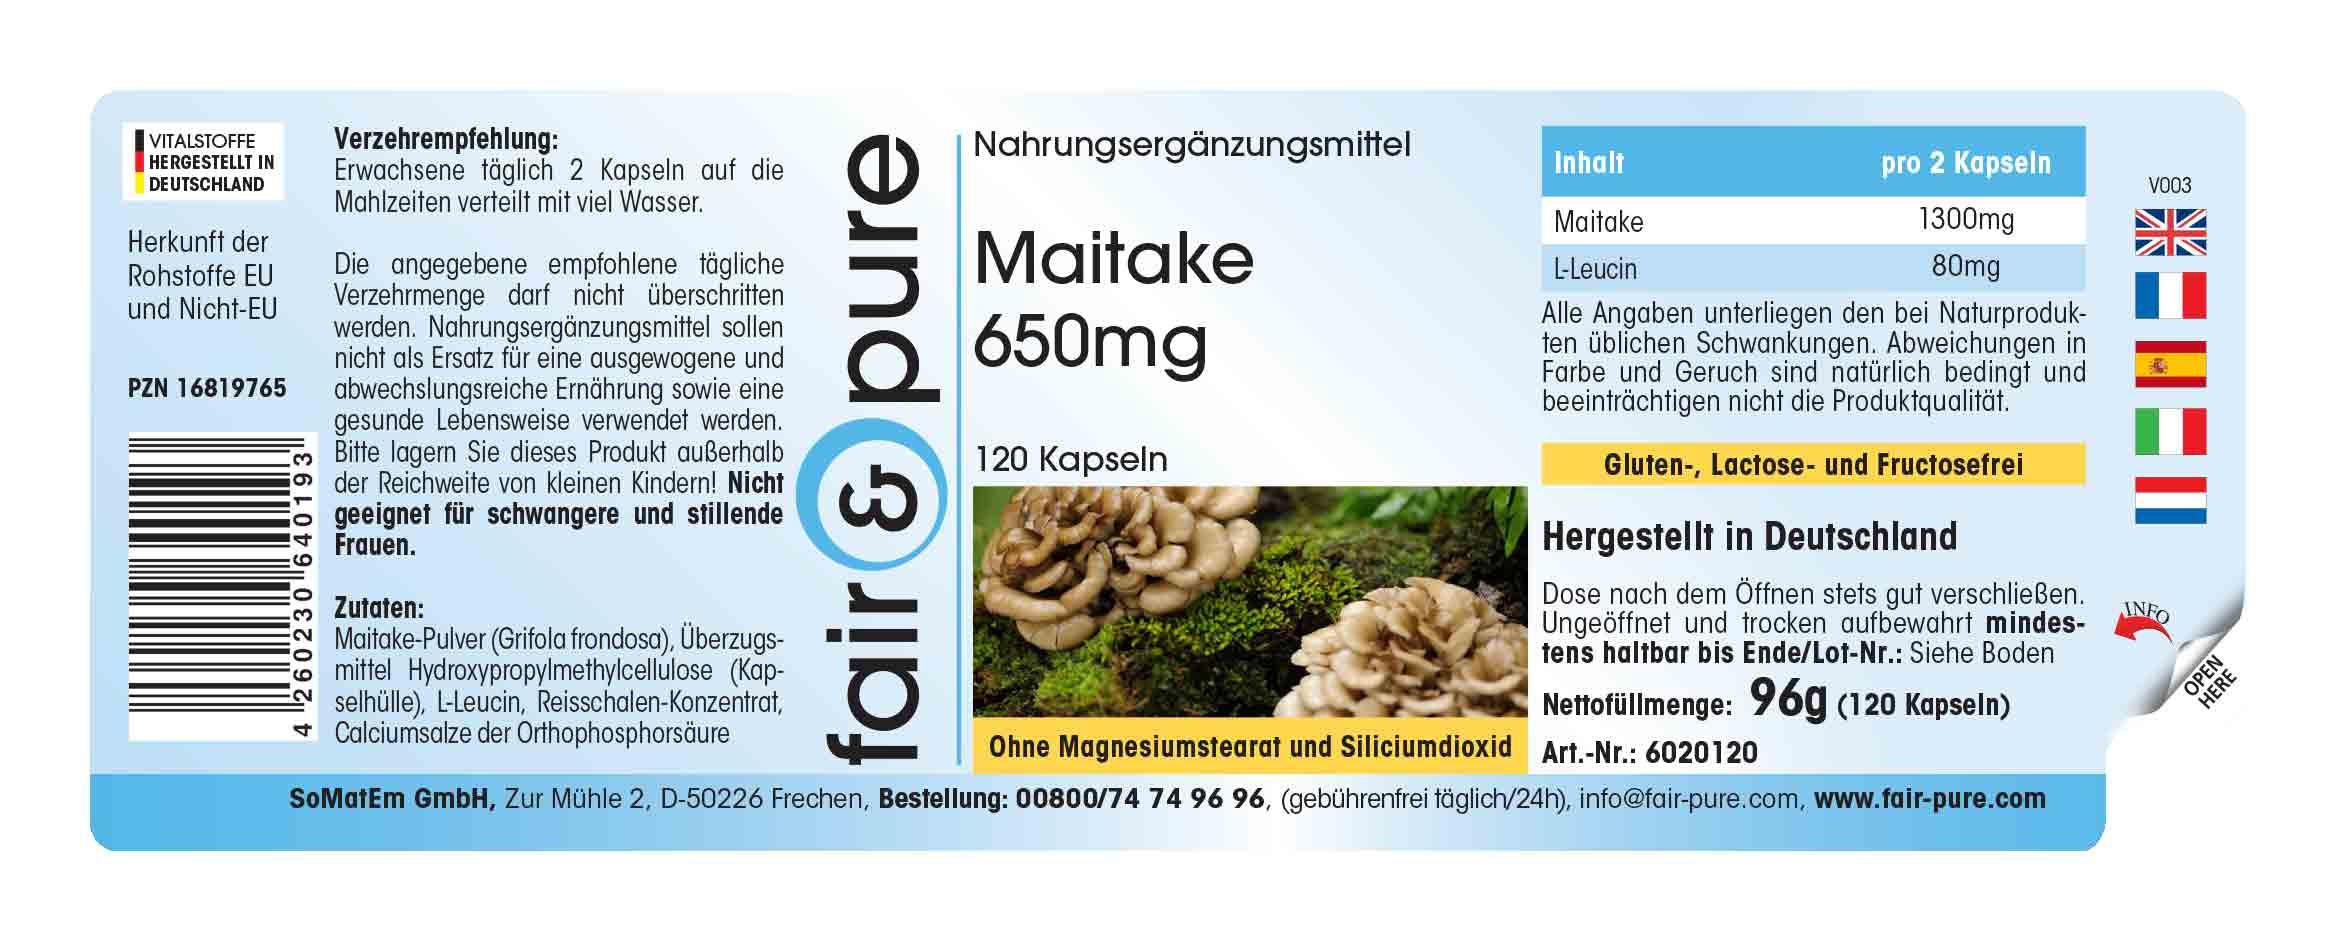 Maitake 650mg - 120 capsules Grifola frondosa, vegan